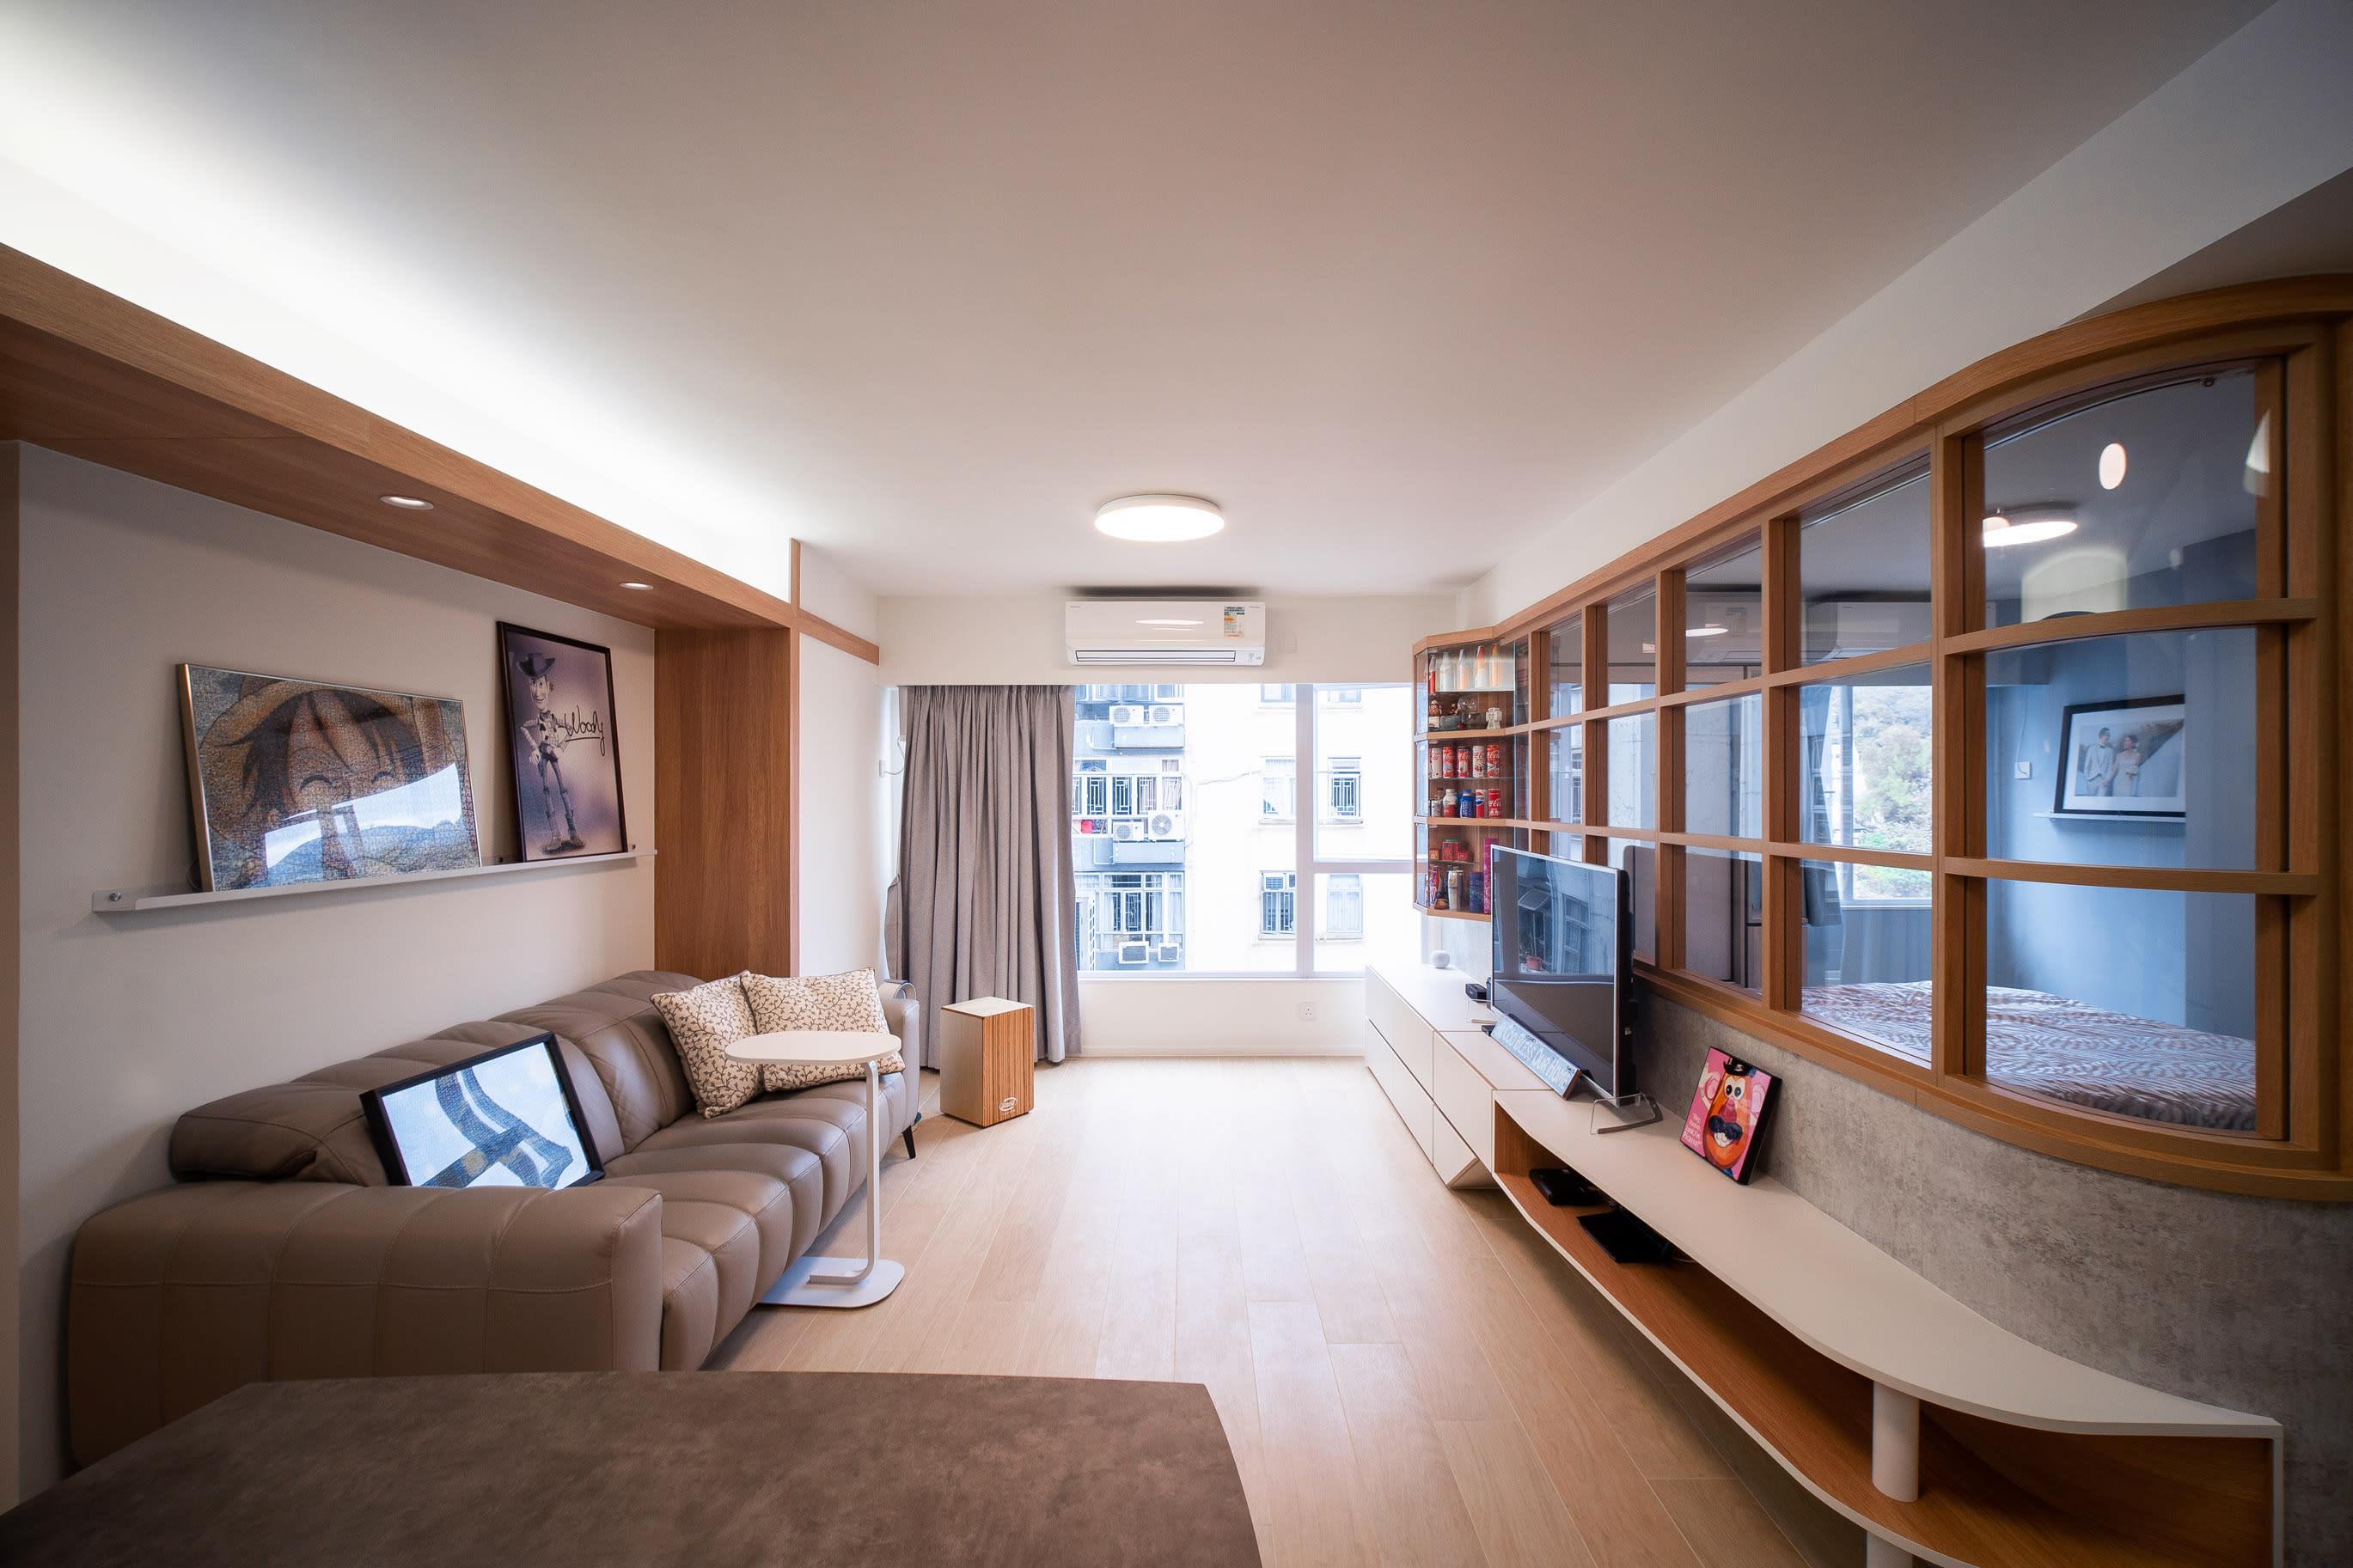 https://res.cloudinary.com/www-designidk-com/image/upload/v1627366109/articles/8917/meifoo-sun-chuen-mnop-interior-design_21_dh3njm.jpg